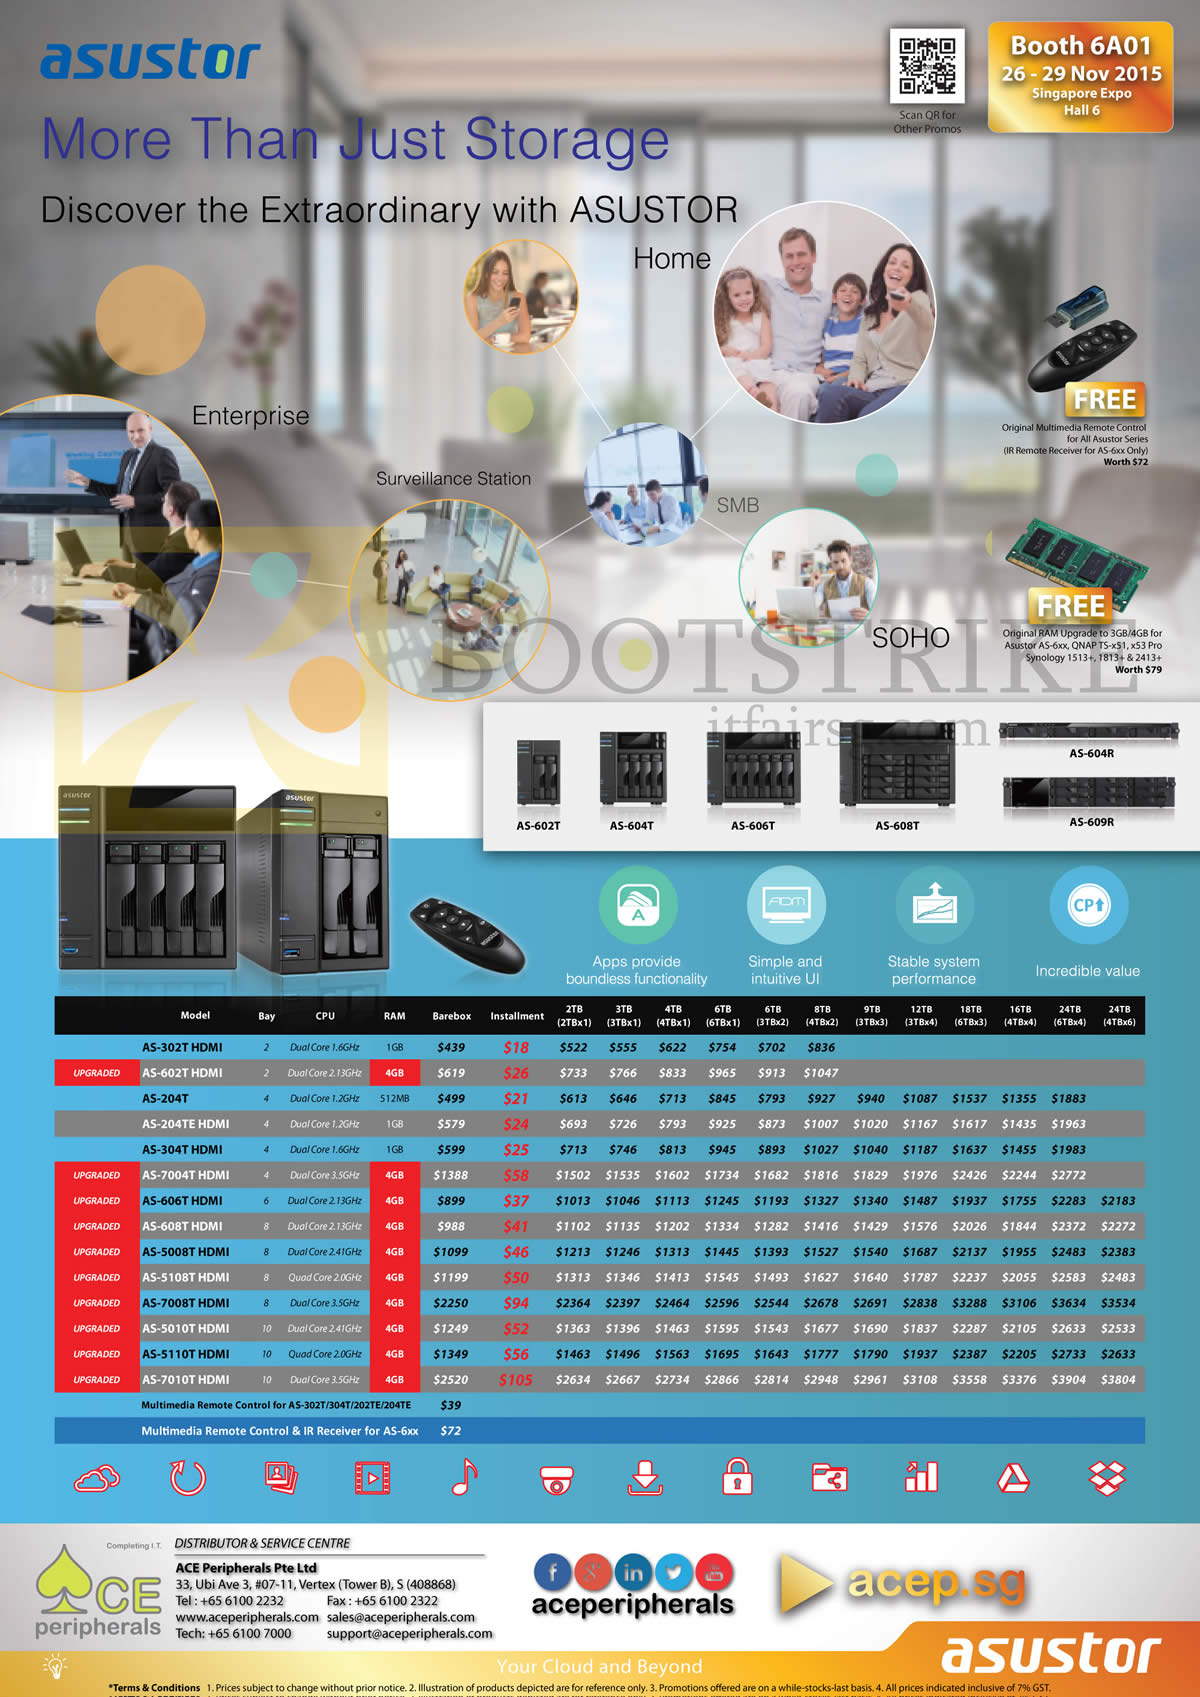 SITEX 2015 price list image brochure of Ace Peripherals Asustor NAS AS 202T AS 202TE AS 204T AS 204TE AS 302T AS 304T AS 602T AS 604T AS 606T AS 608T AS 7004T AS 7008T AS 7010T